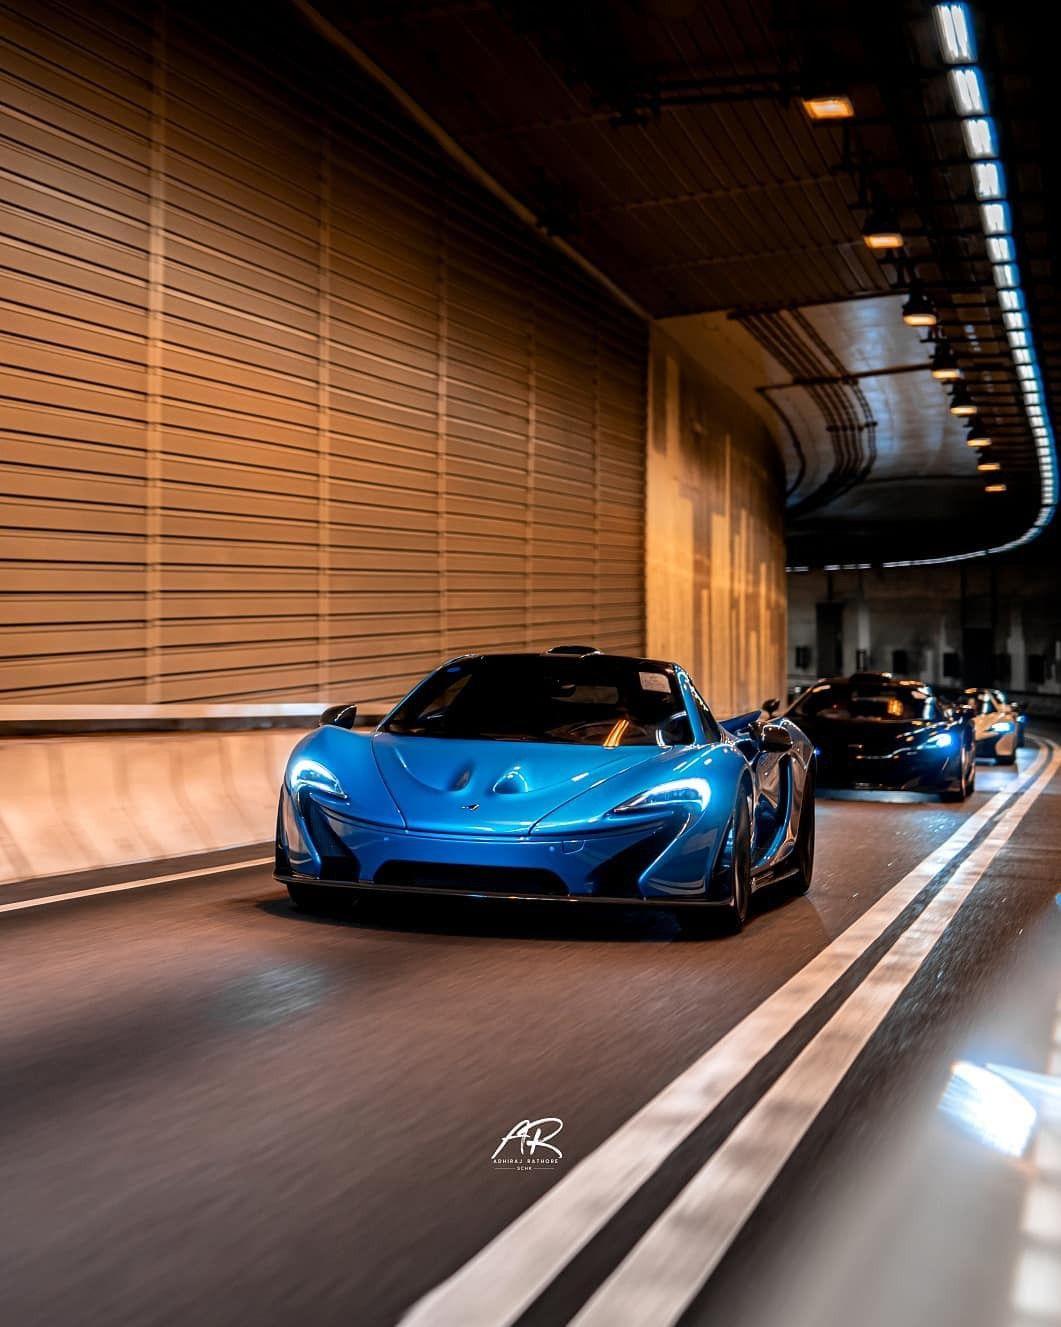 Mclaren P1 In 2020 Sports Cars Luxury Dream Cars Cool Cars